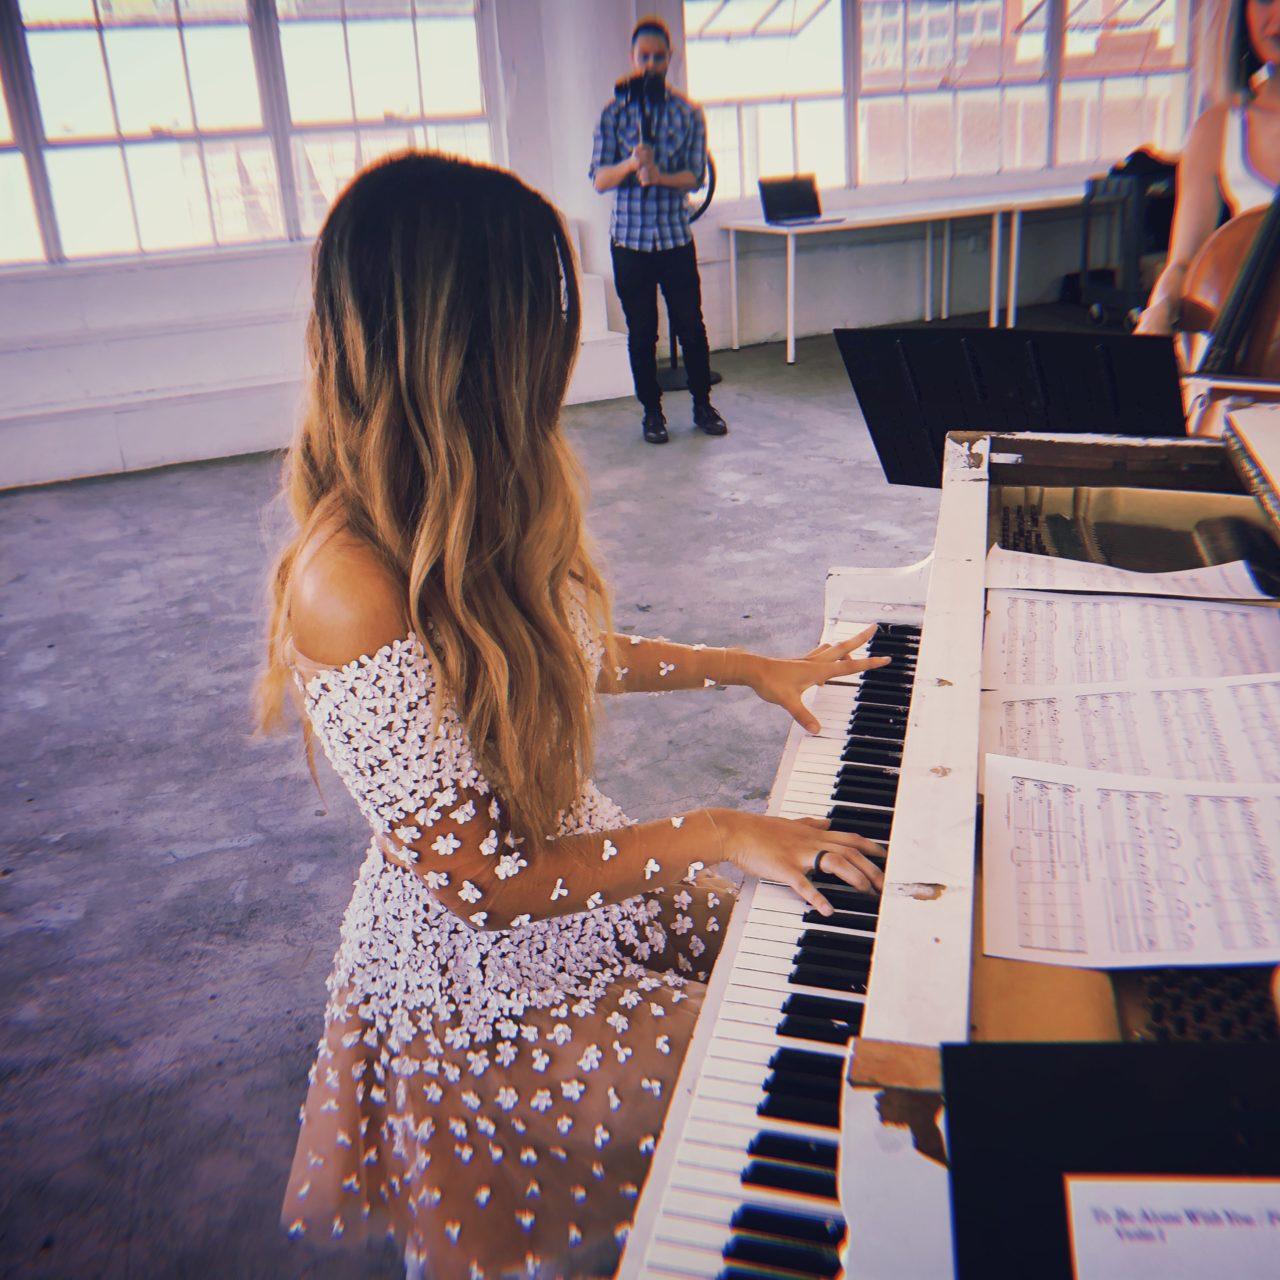 http://www.summersweesingh.com/wp-content/uploads/2019/01/White-Piano-1280x1280.jpg